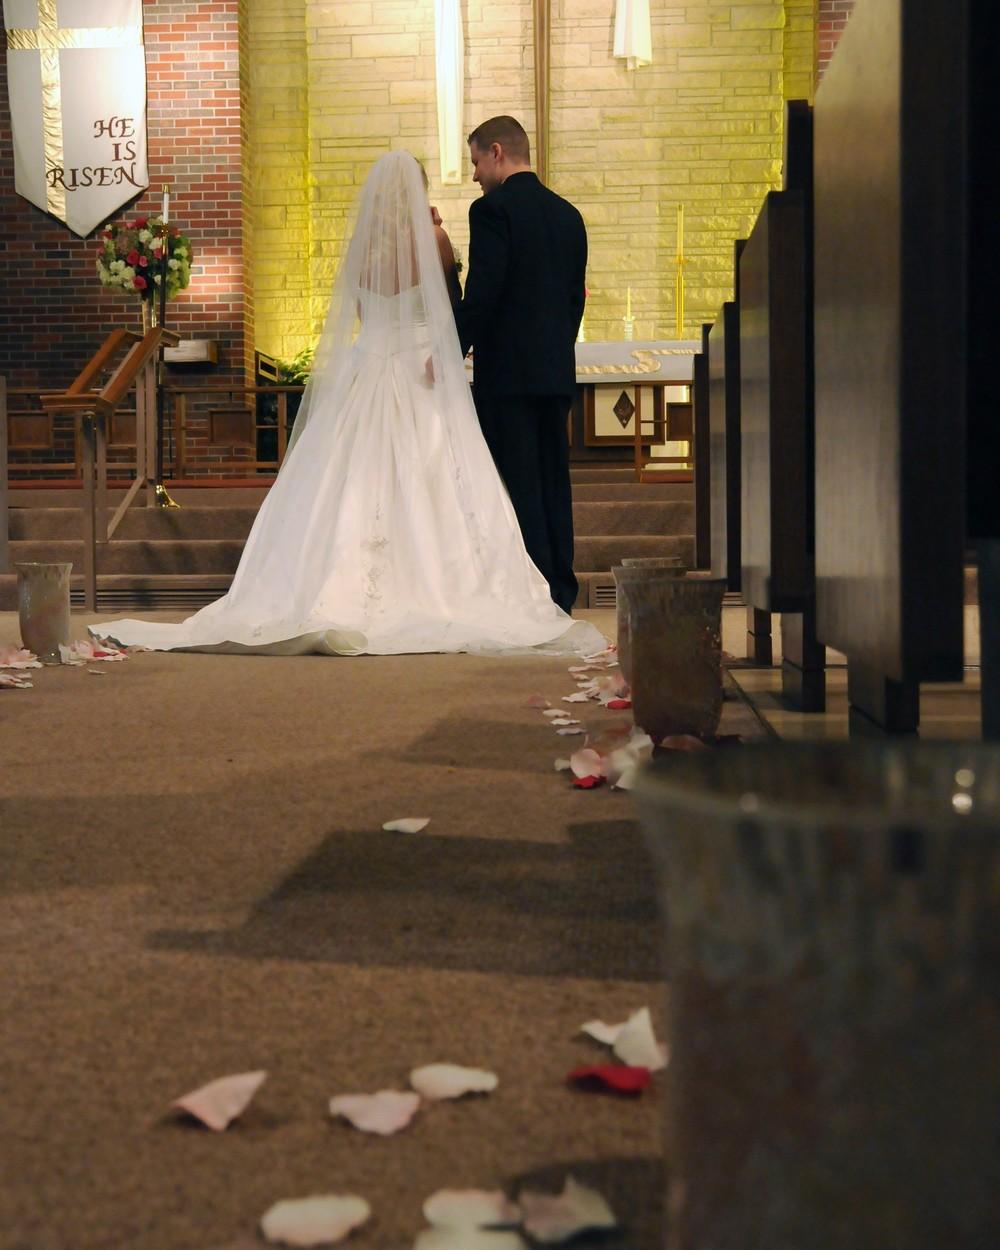 Bride & Groom at altar.jpg